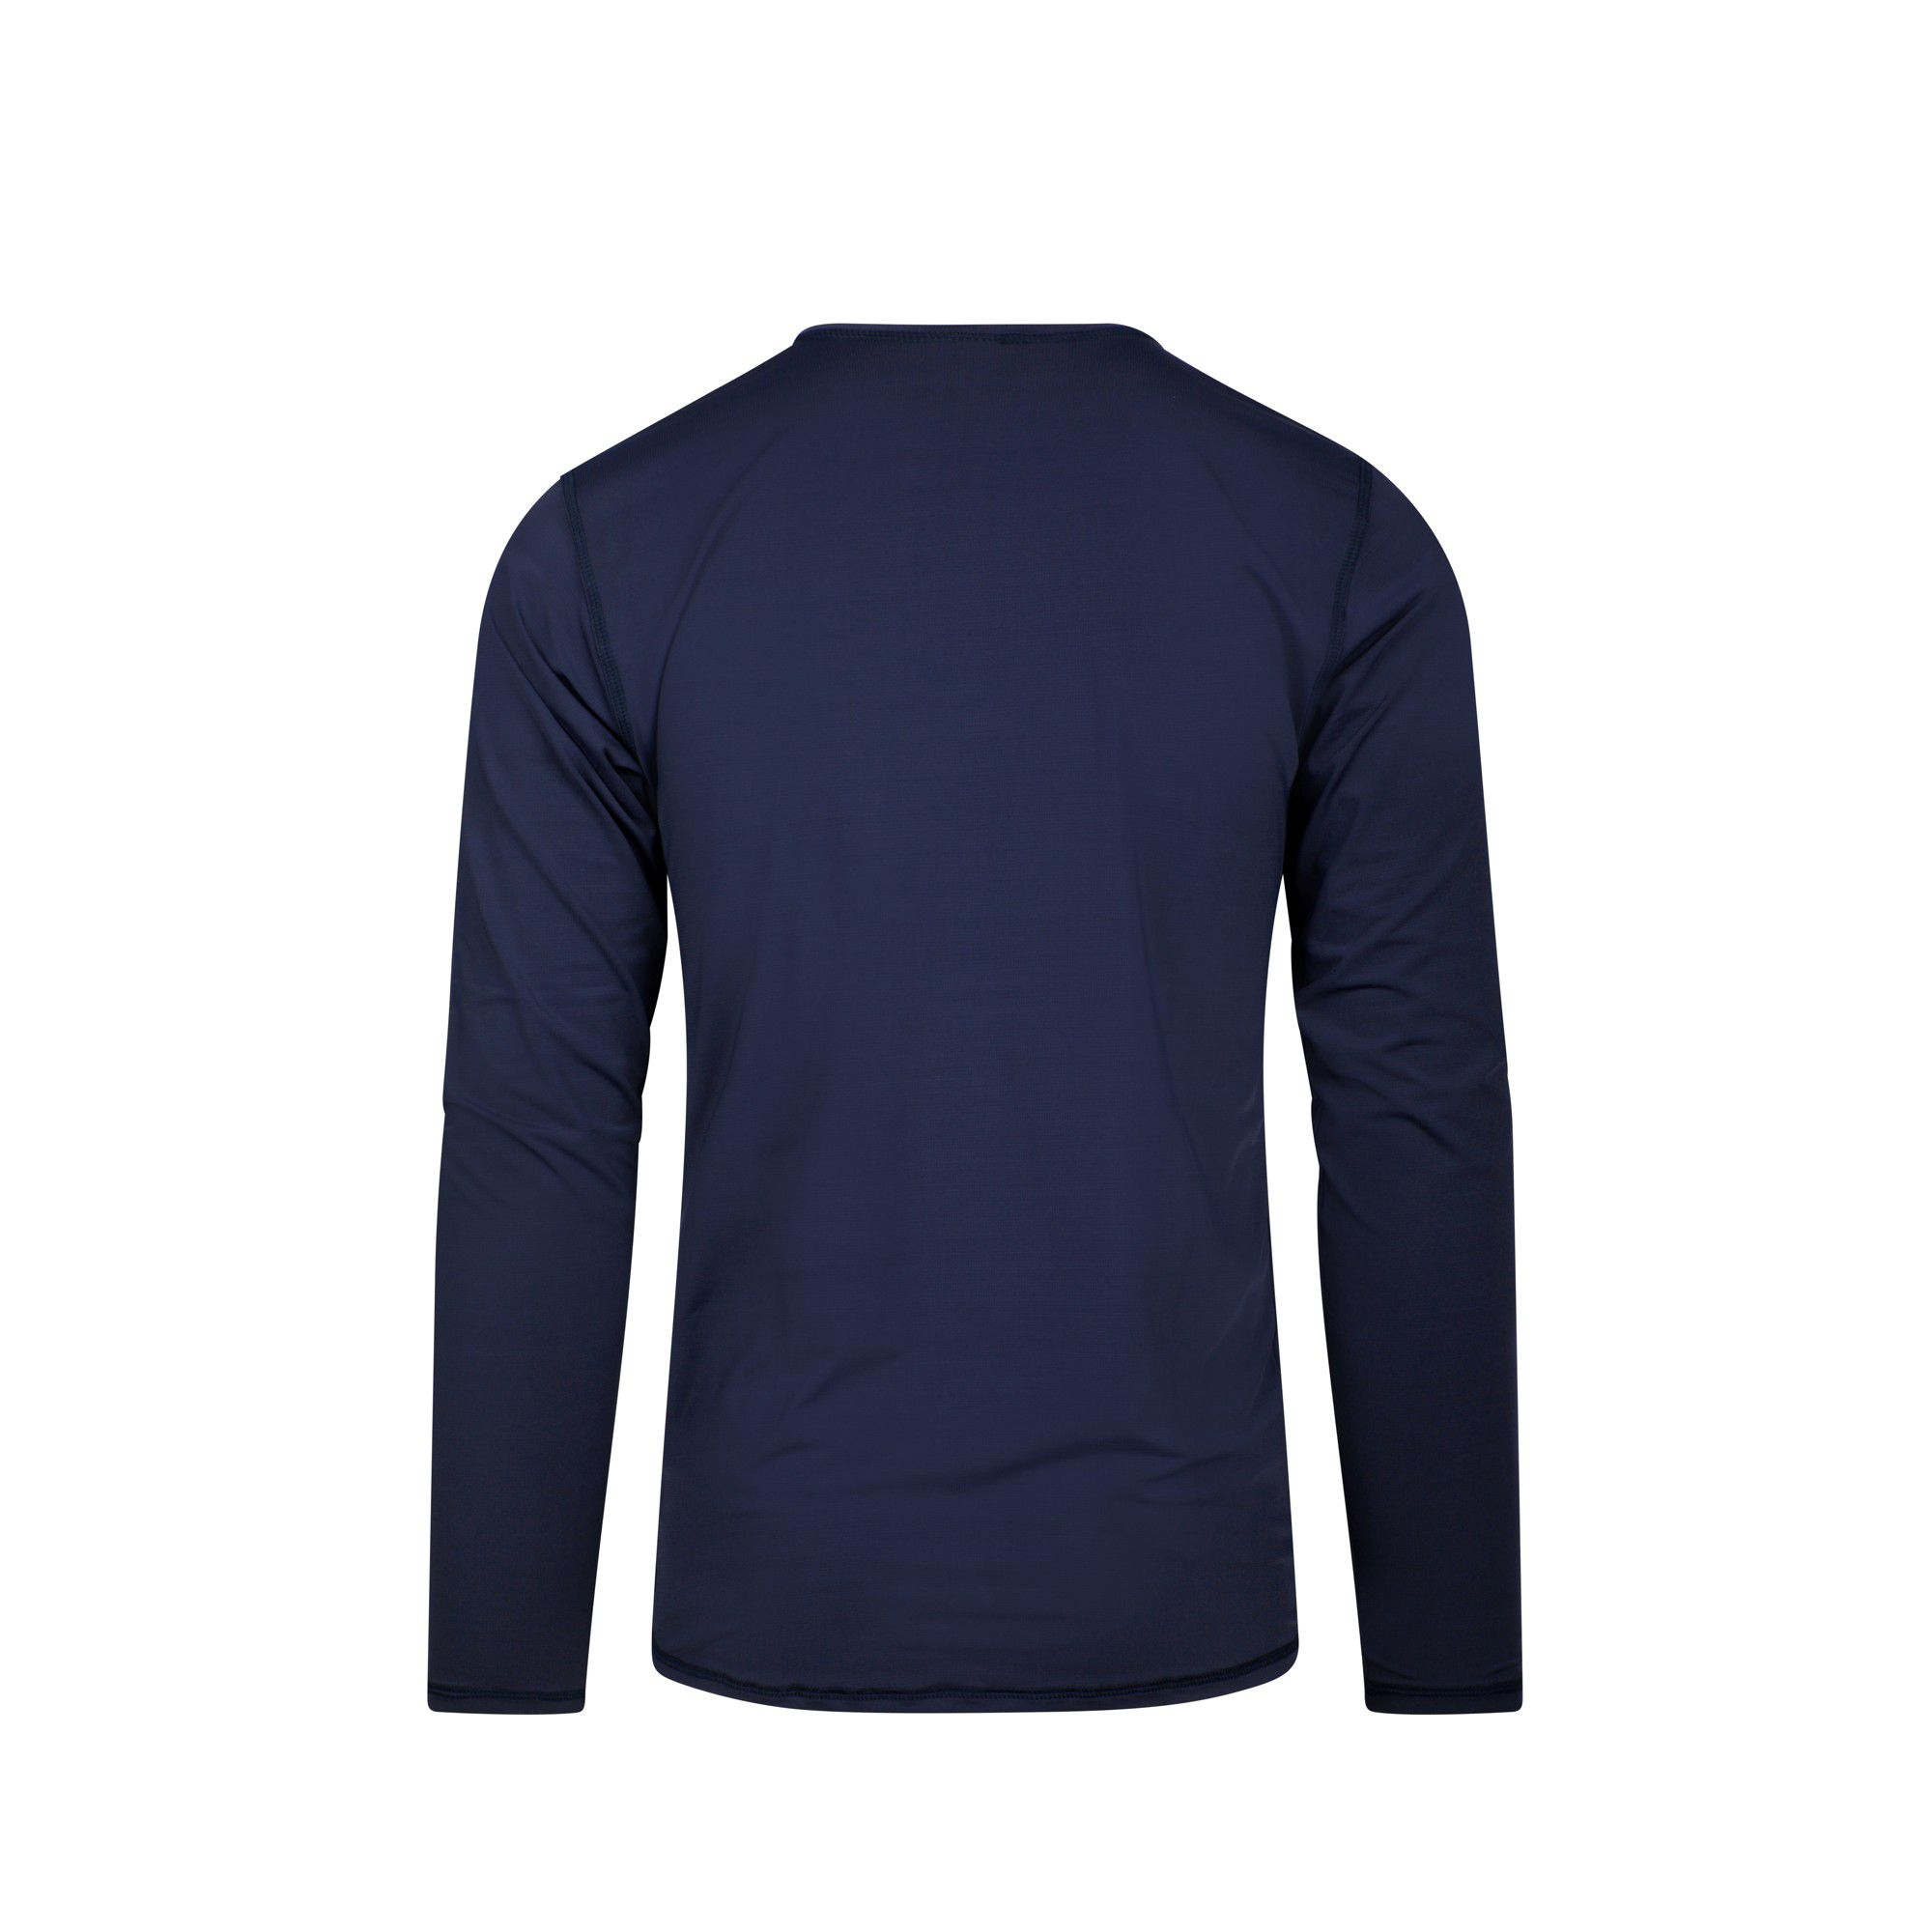 Camiseta Manga Longa Masculina Hard Duo-Outdoor Proteção Solar UV50+ - Azul Marinho